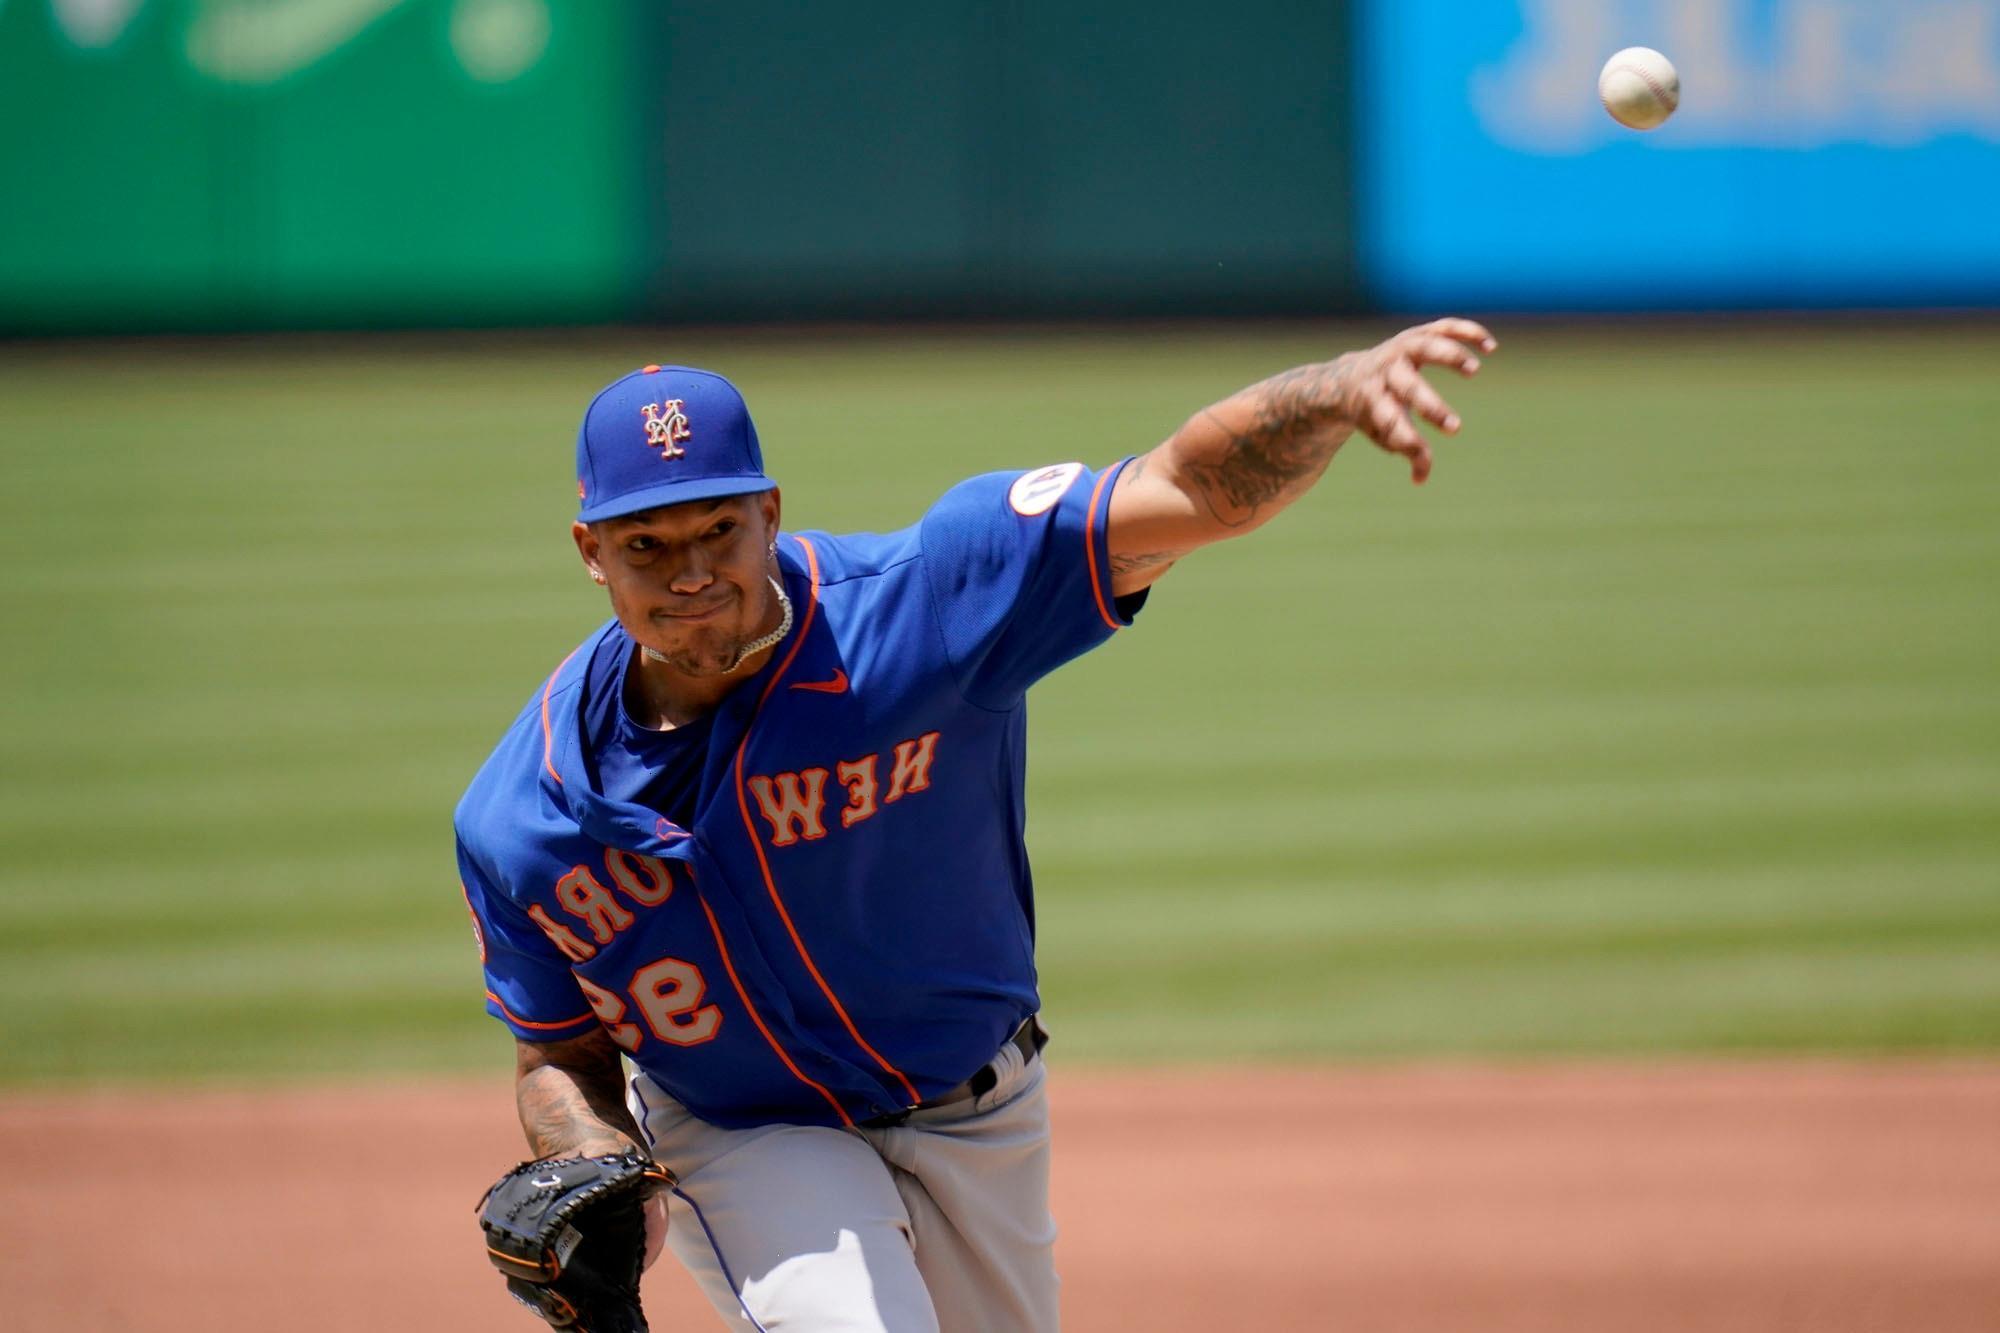 Taijuan Walker's gem paves way for Mets to salvage St. Louis split